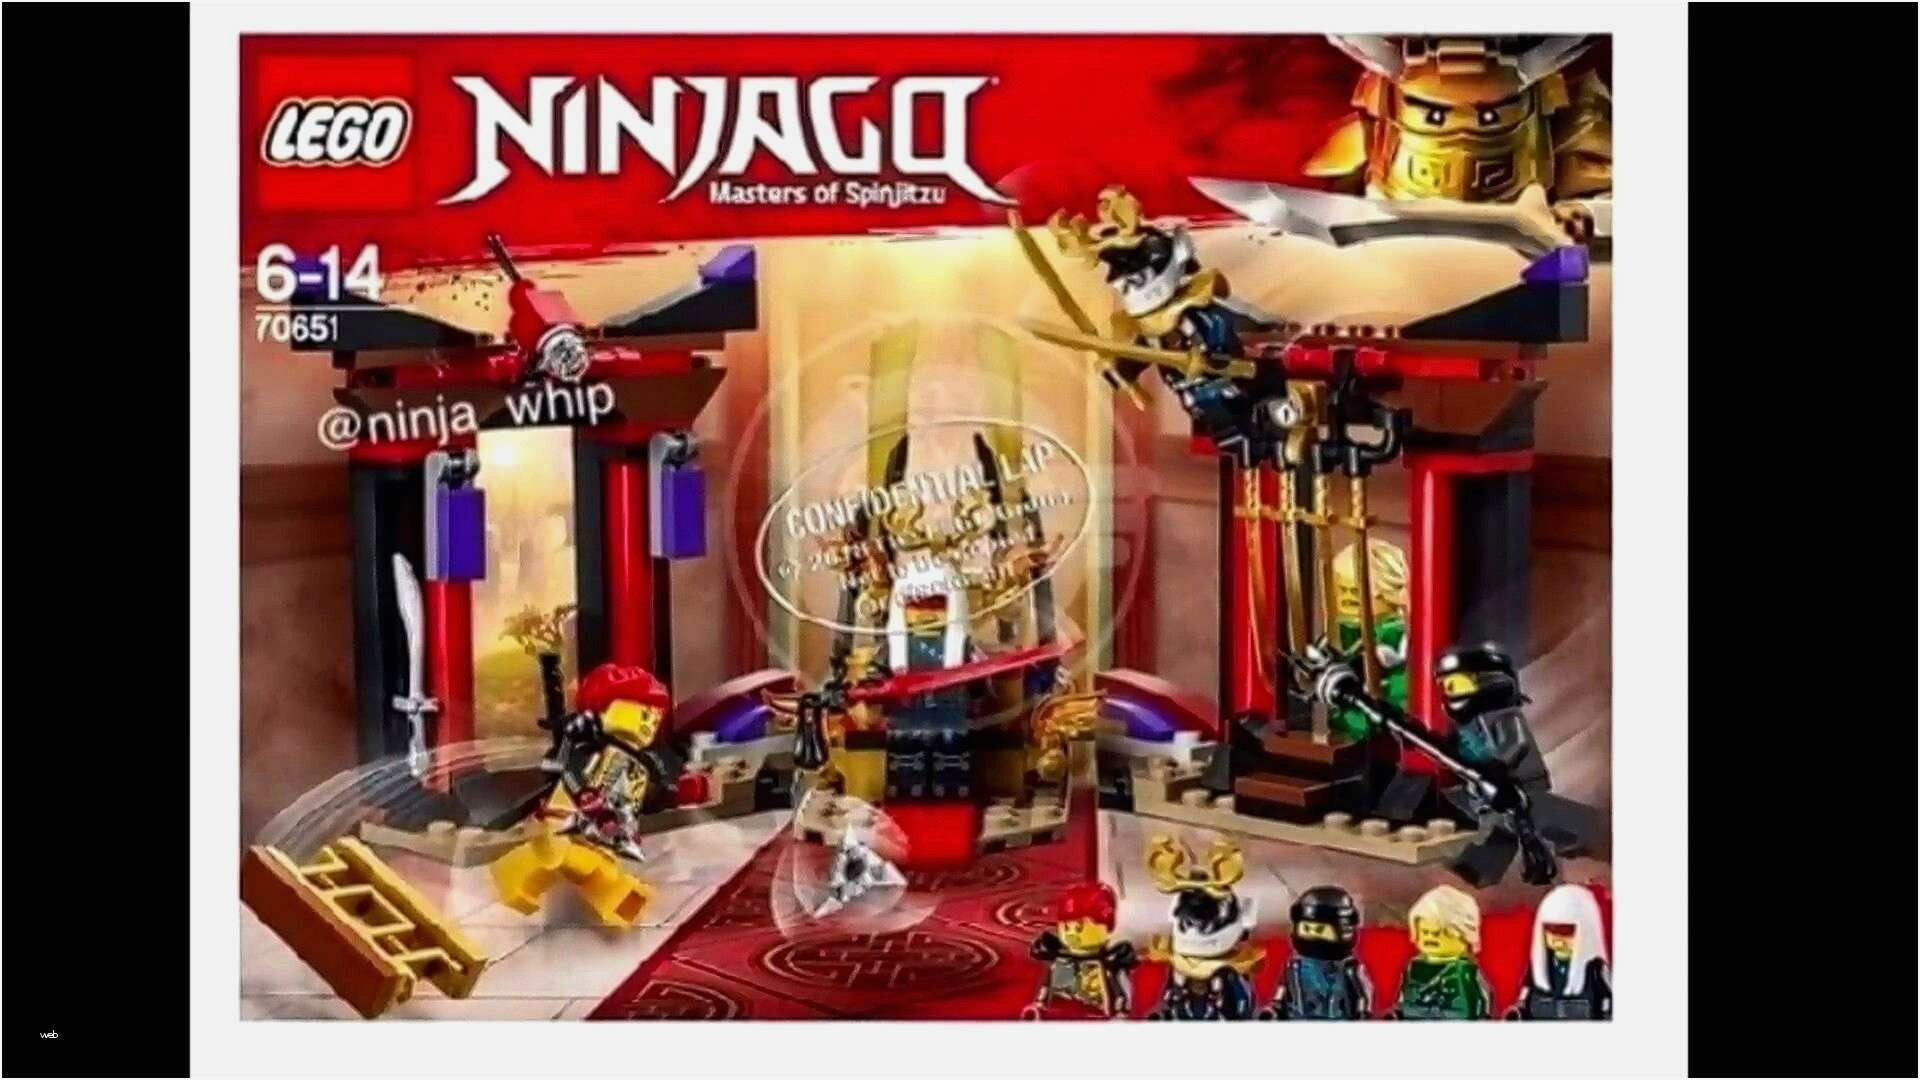 Lego Ninjago Zum Ausmalen Einzigartig Lego Ninjago Ausmalbild Beispielbilder Färben Lego Ninjago Birthday Stock